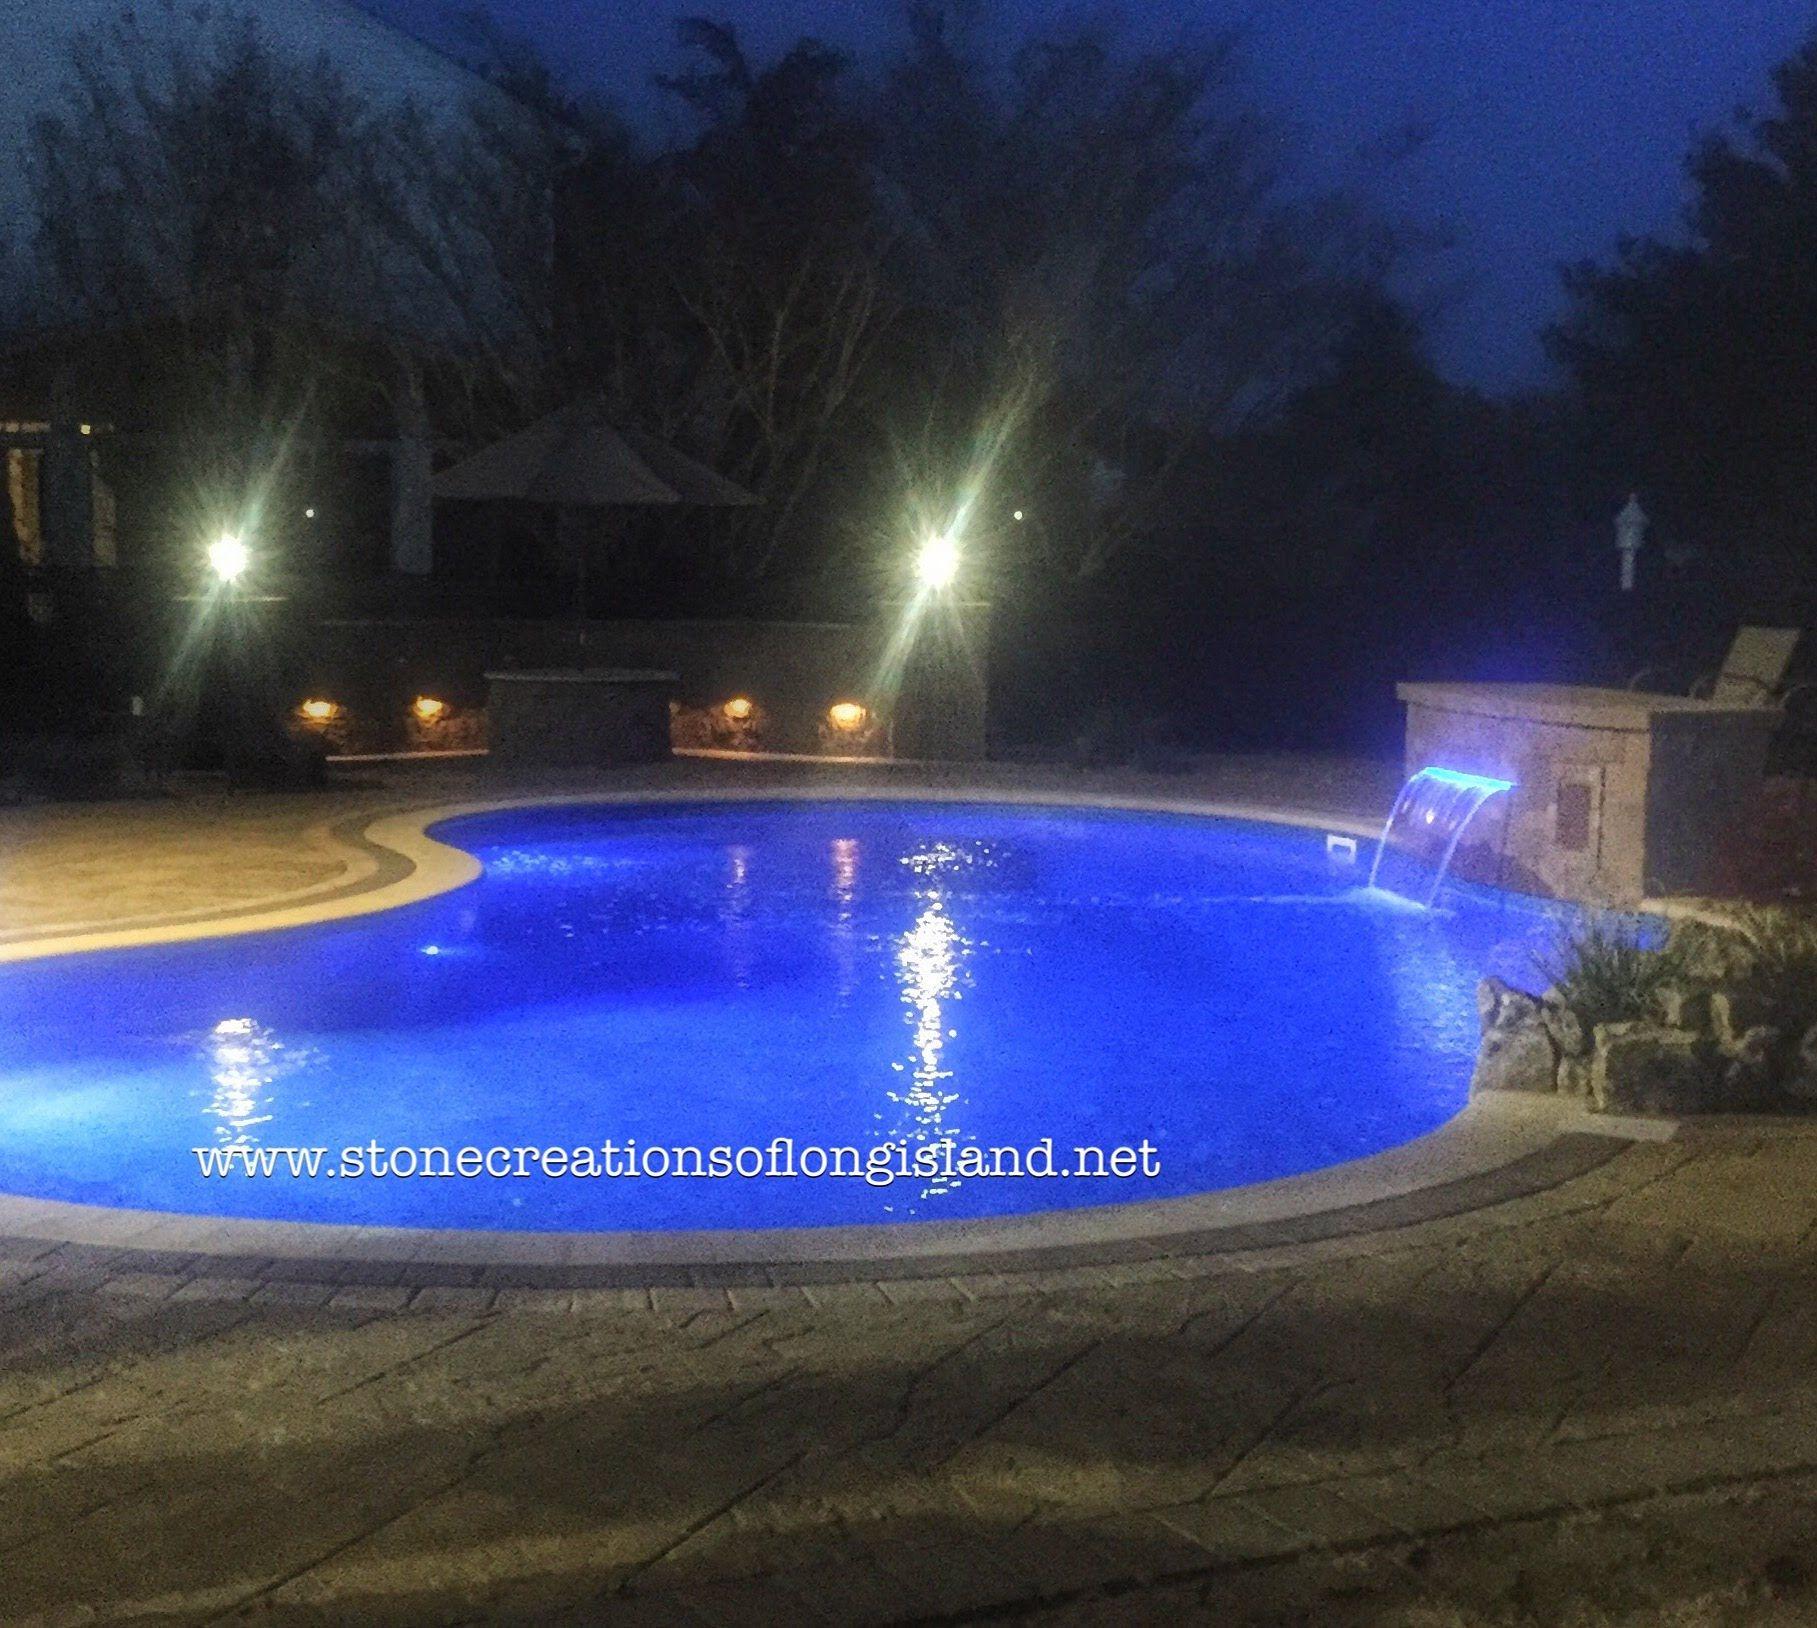 Cambridge Paver Poolscapes, West Islip, N.Y 11795